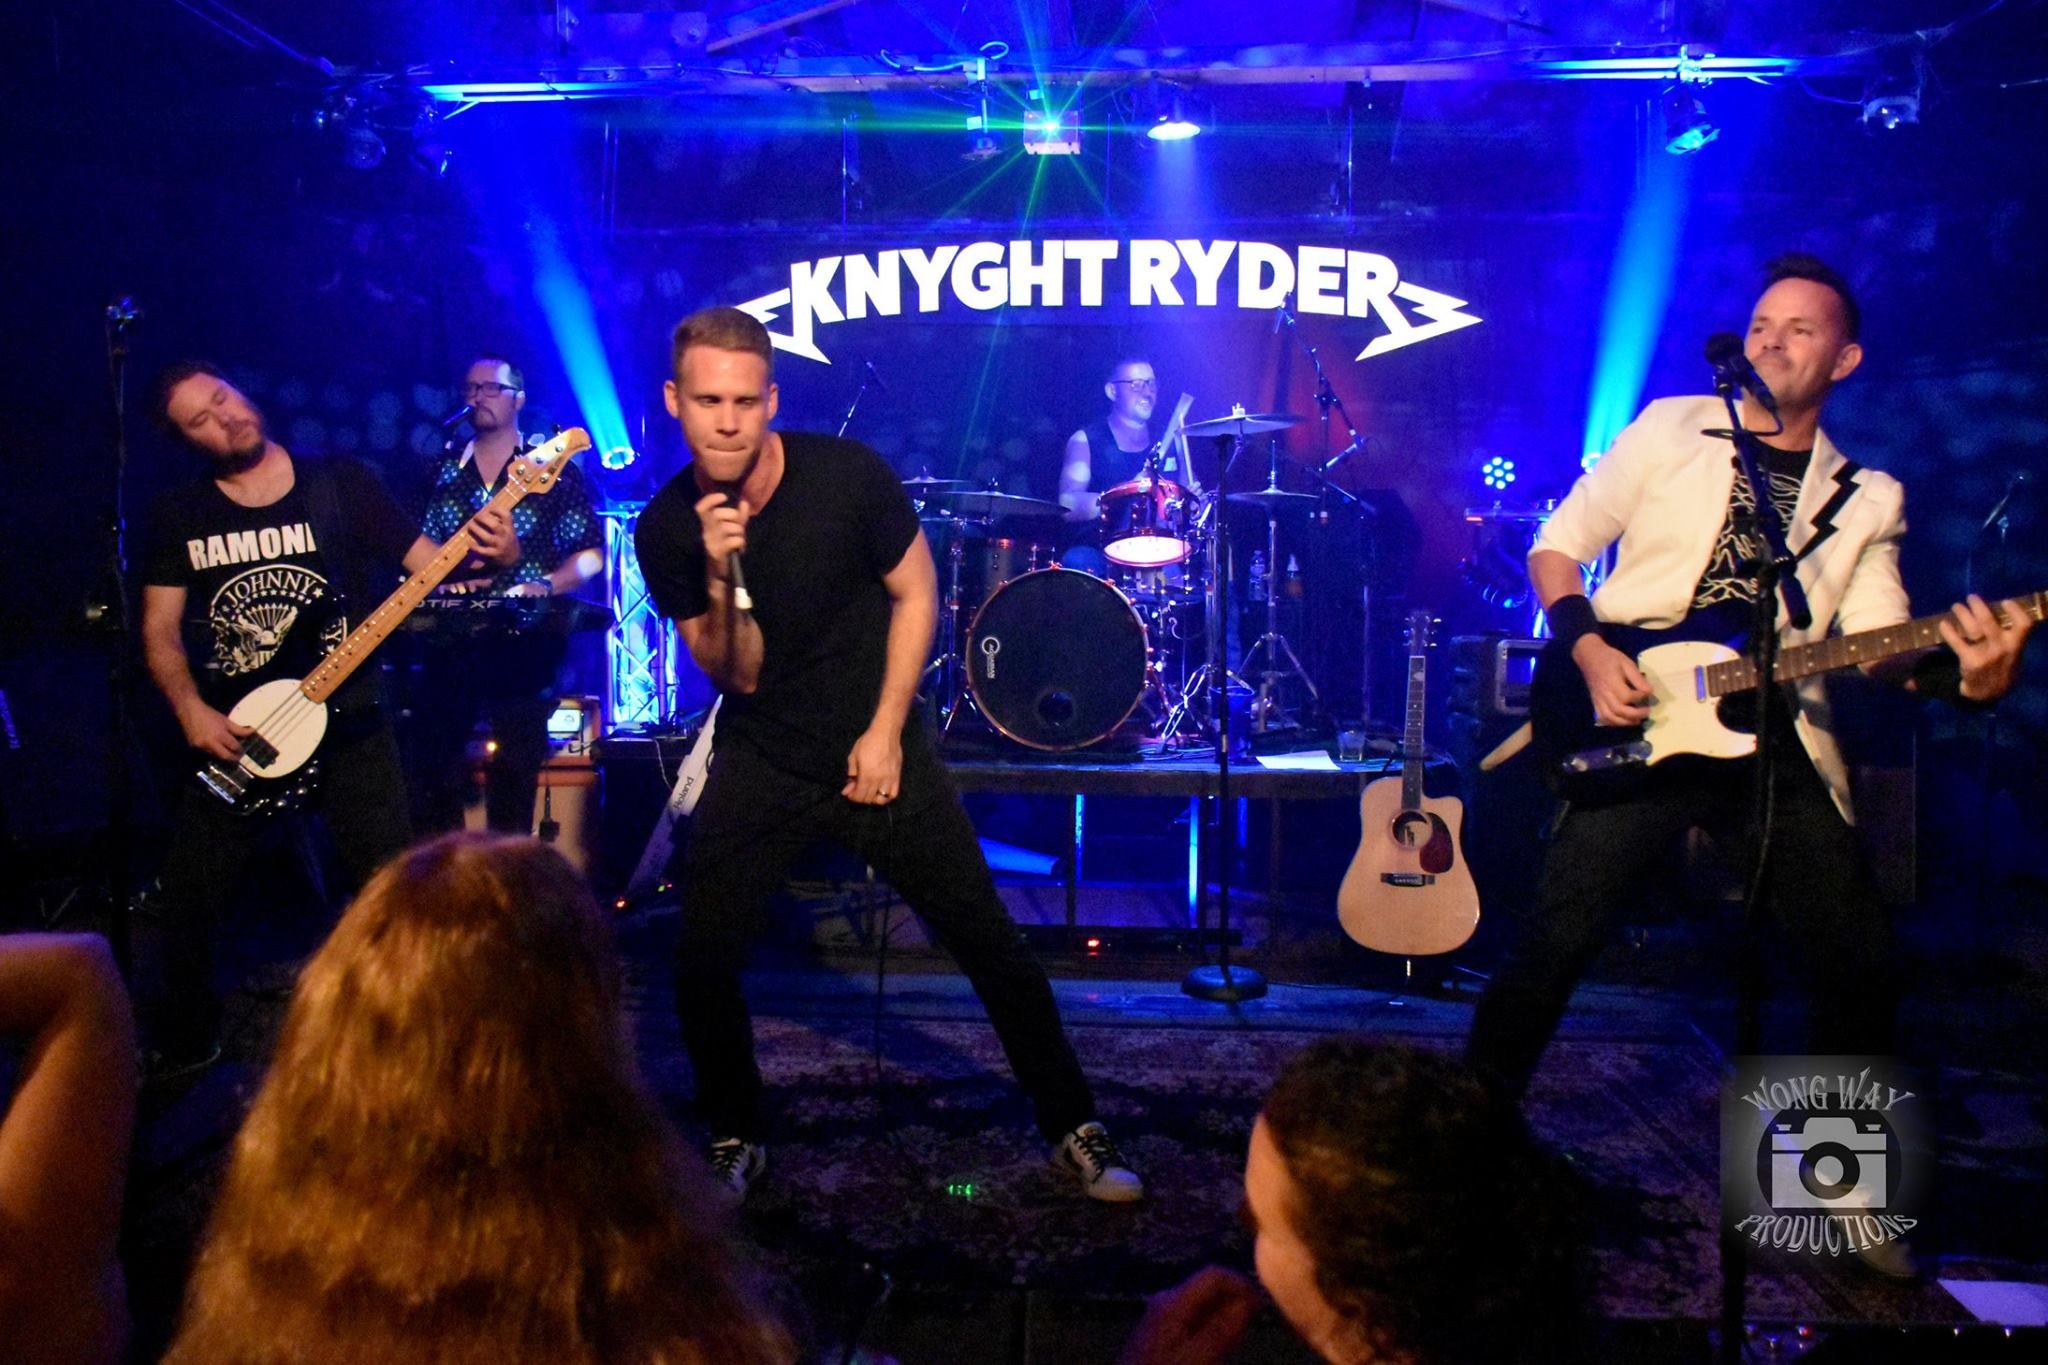 Knyght Ryder